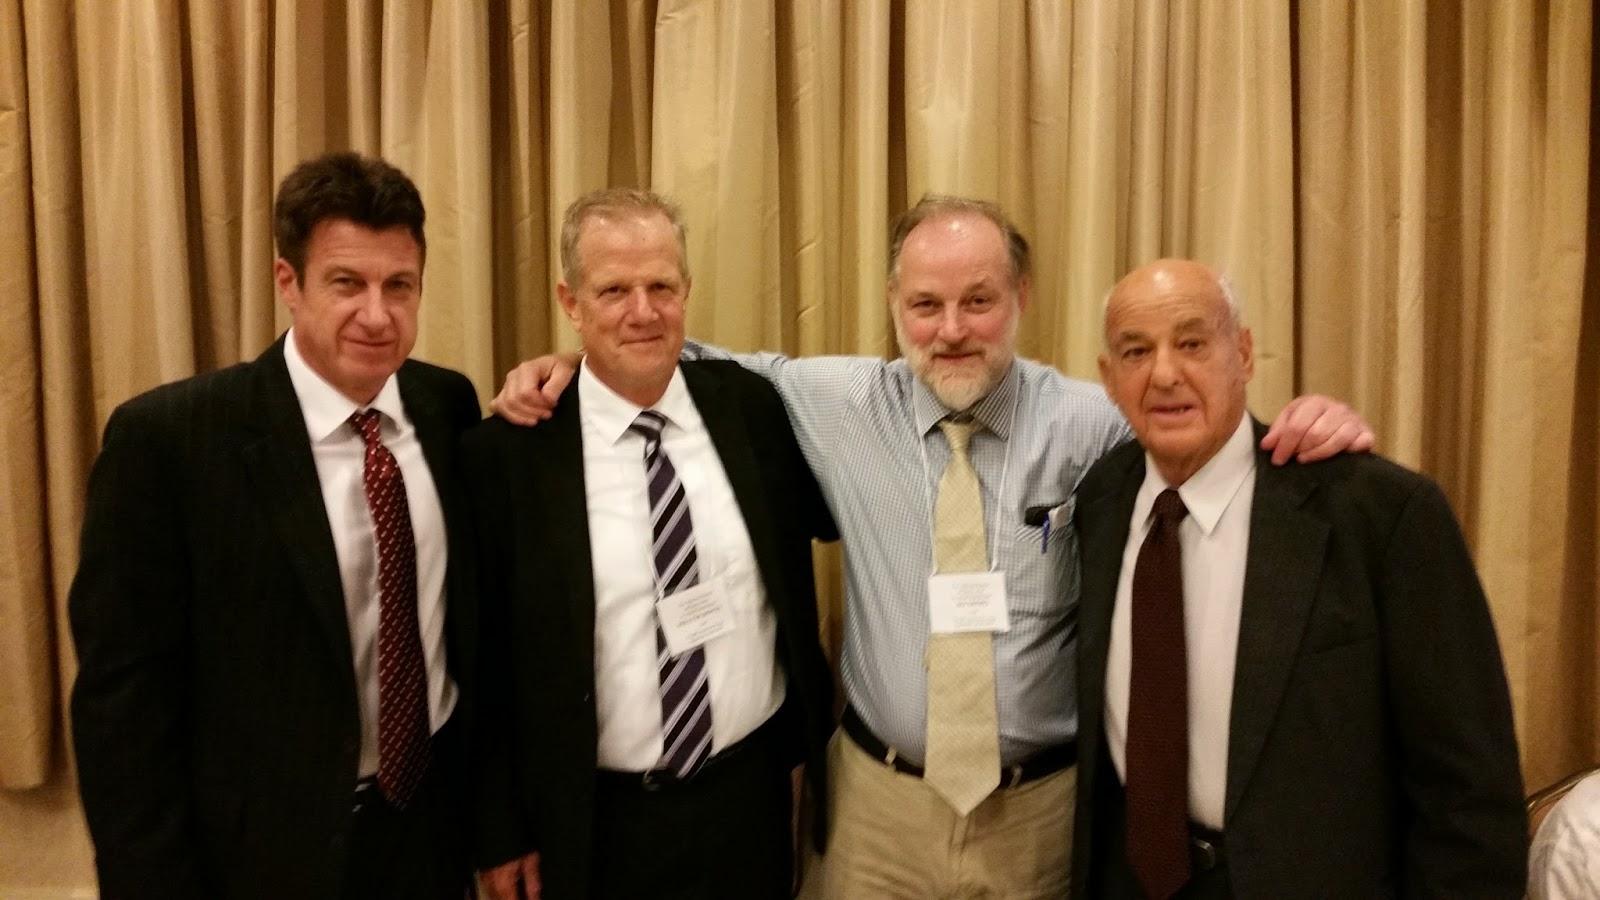 Founding members David Denton, Walter Boyes, and Ed Tatro